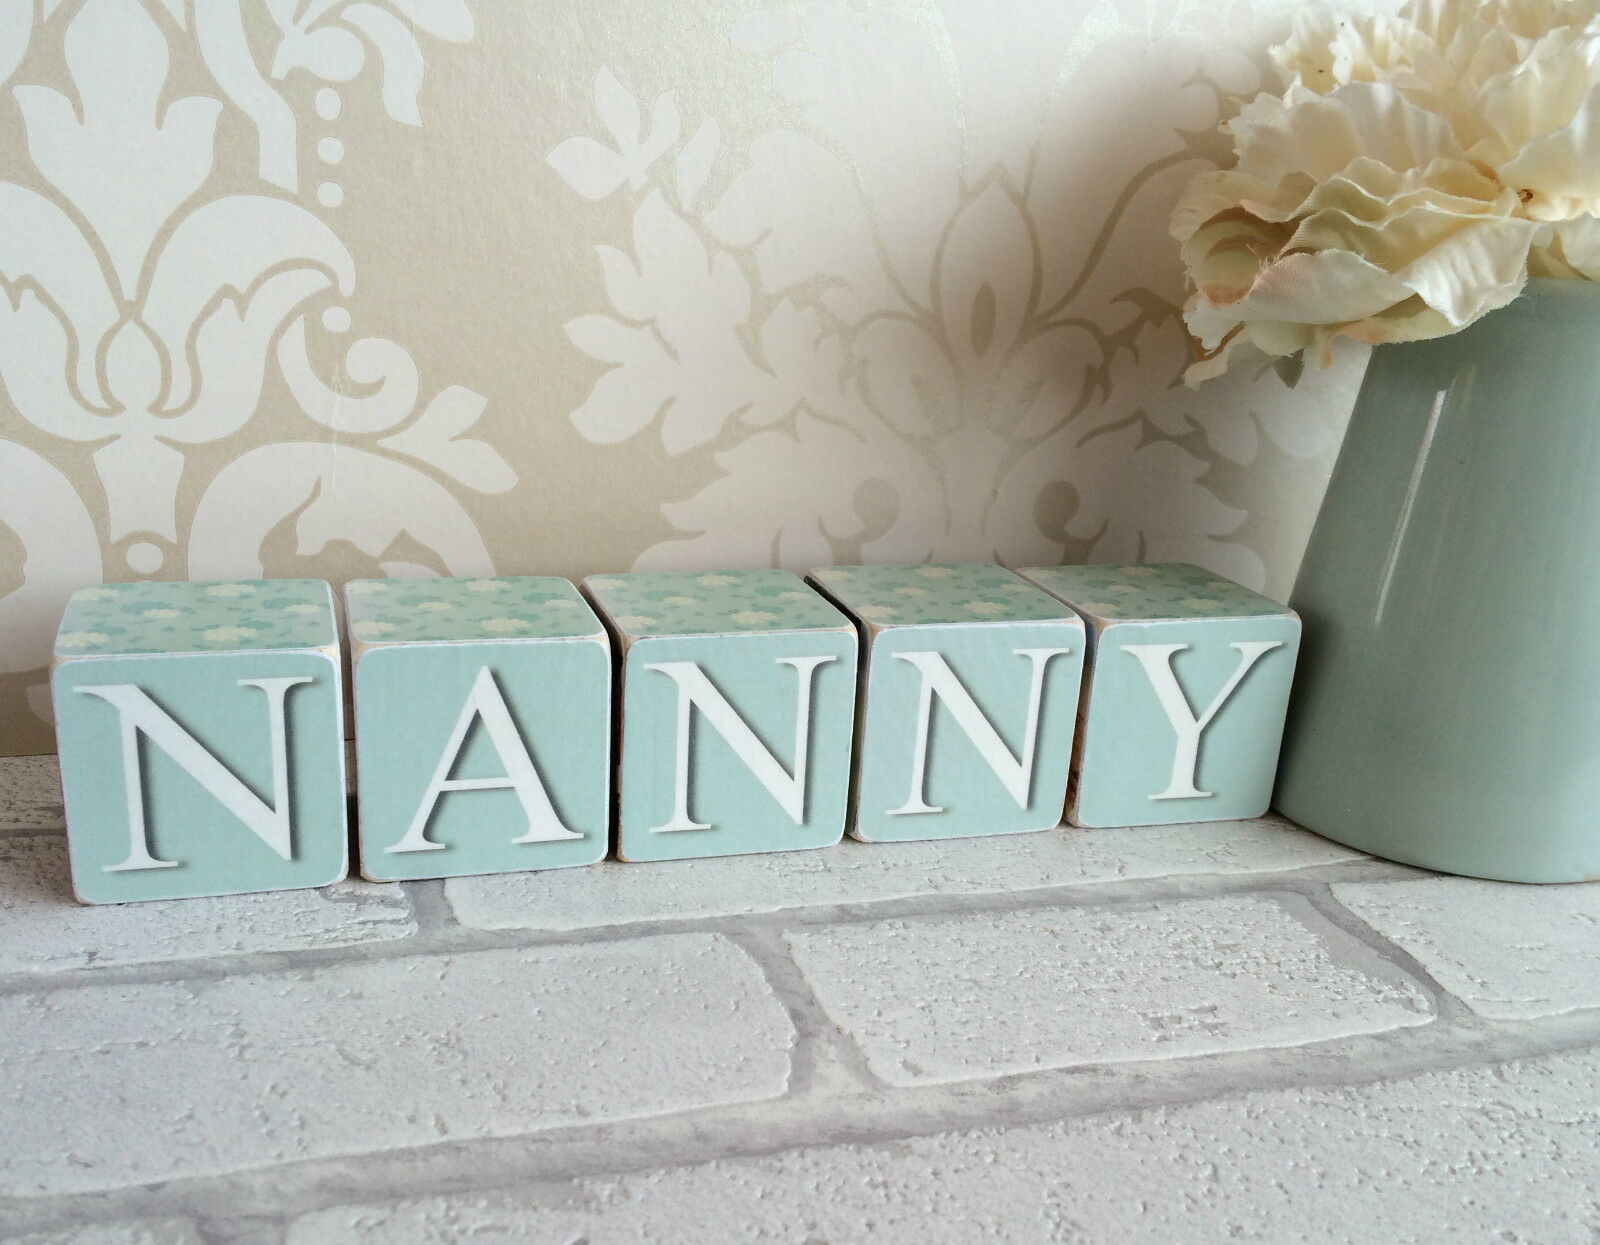 Hecho A Mano Personalizado Foto Cubos Nanny Nanny Nanny Nan Momia Mamá Keepsake actual De Regalo 41a608